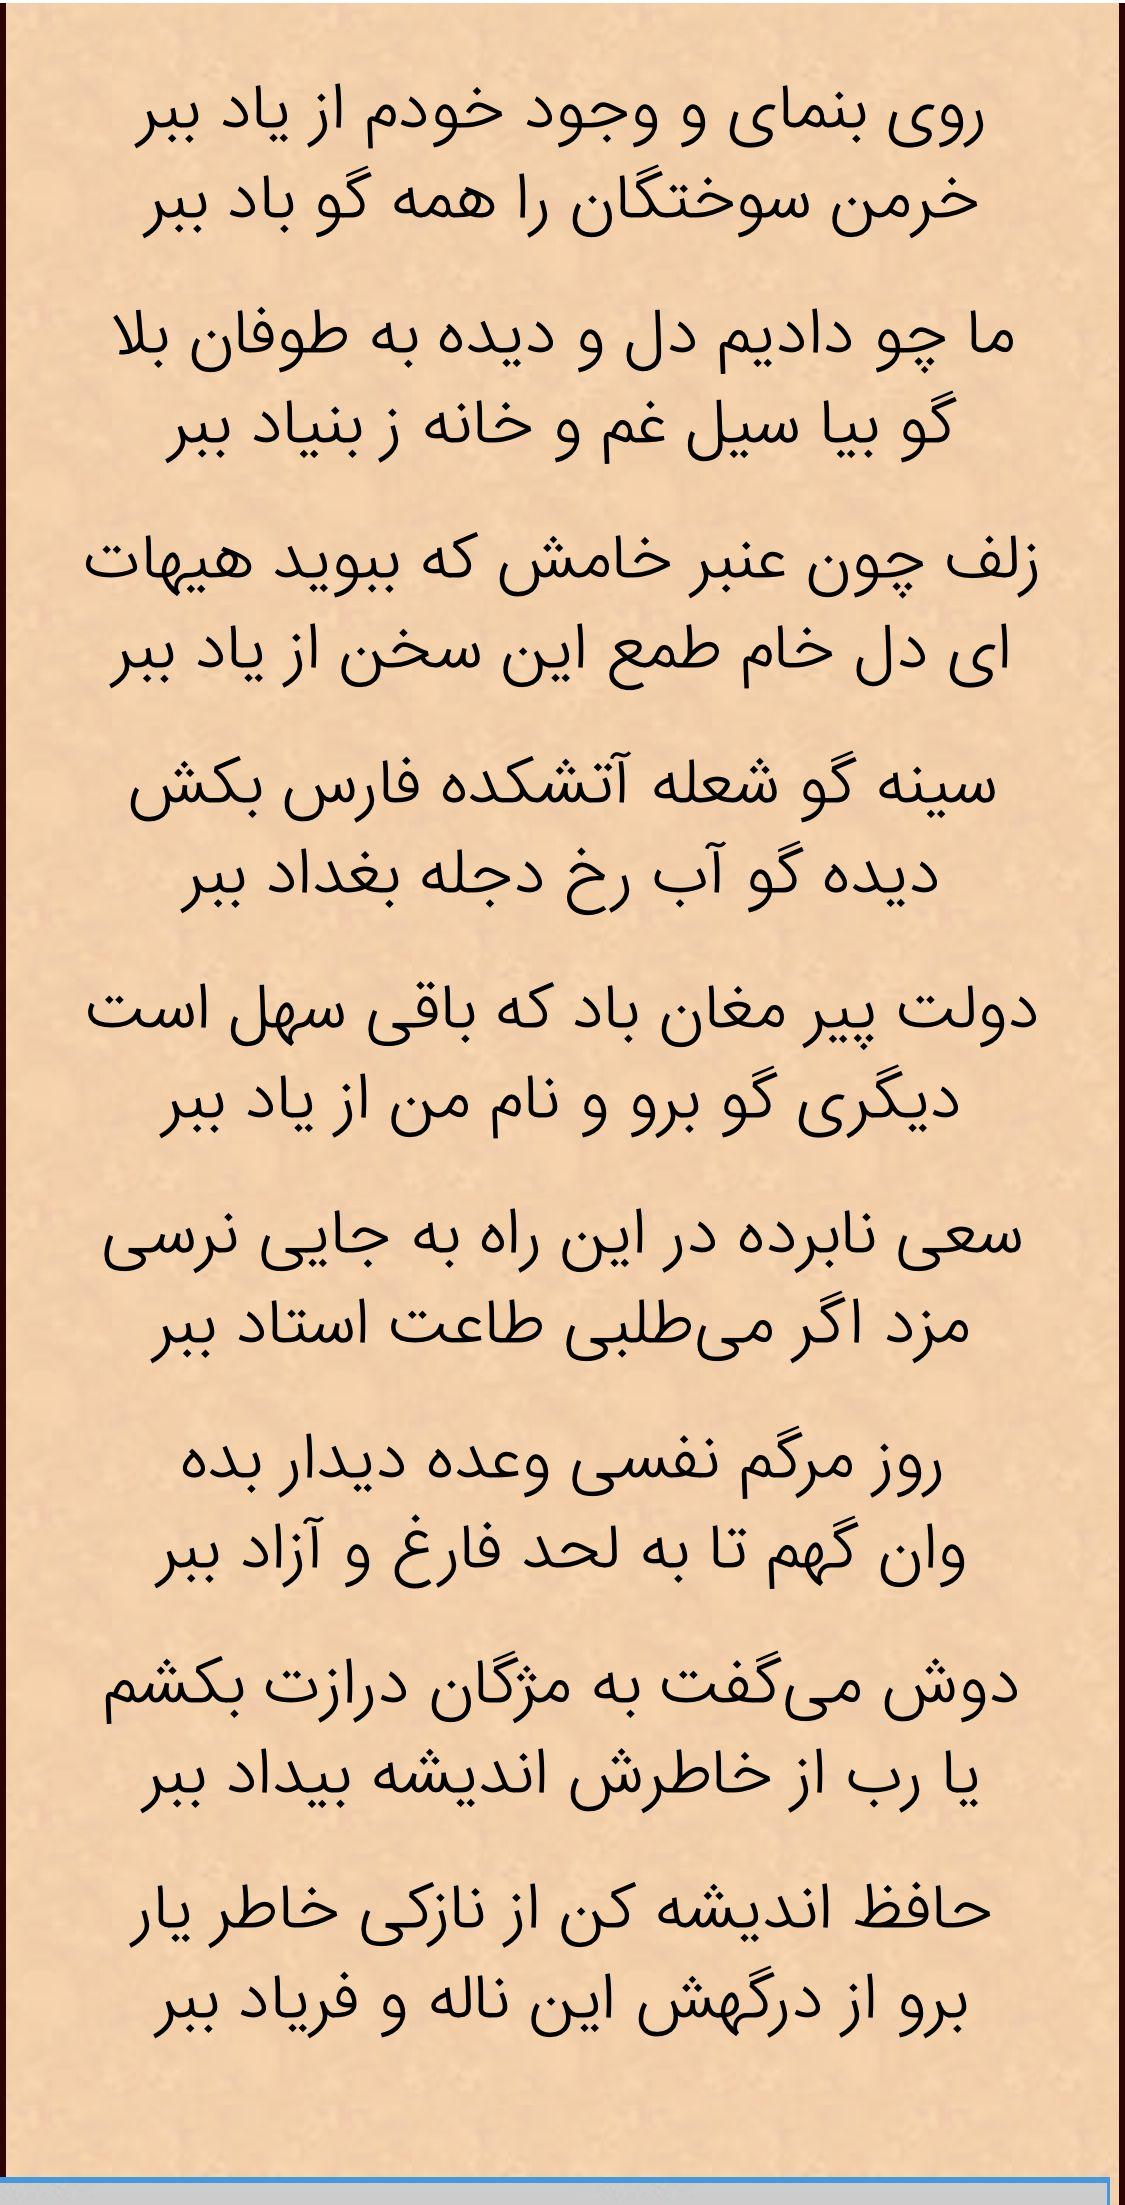 Pin By Sima On Farsi Poem Farsi Poem Poems Sheet Music